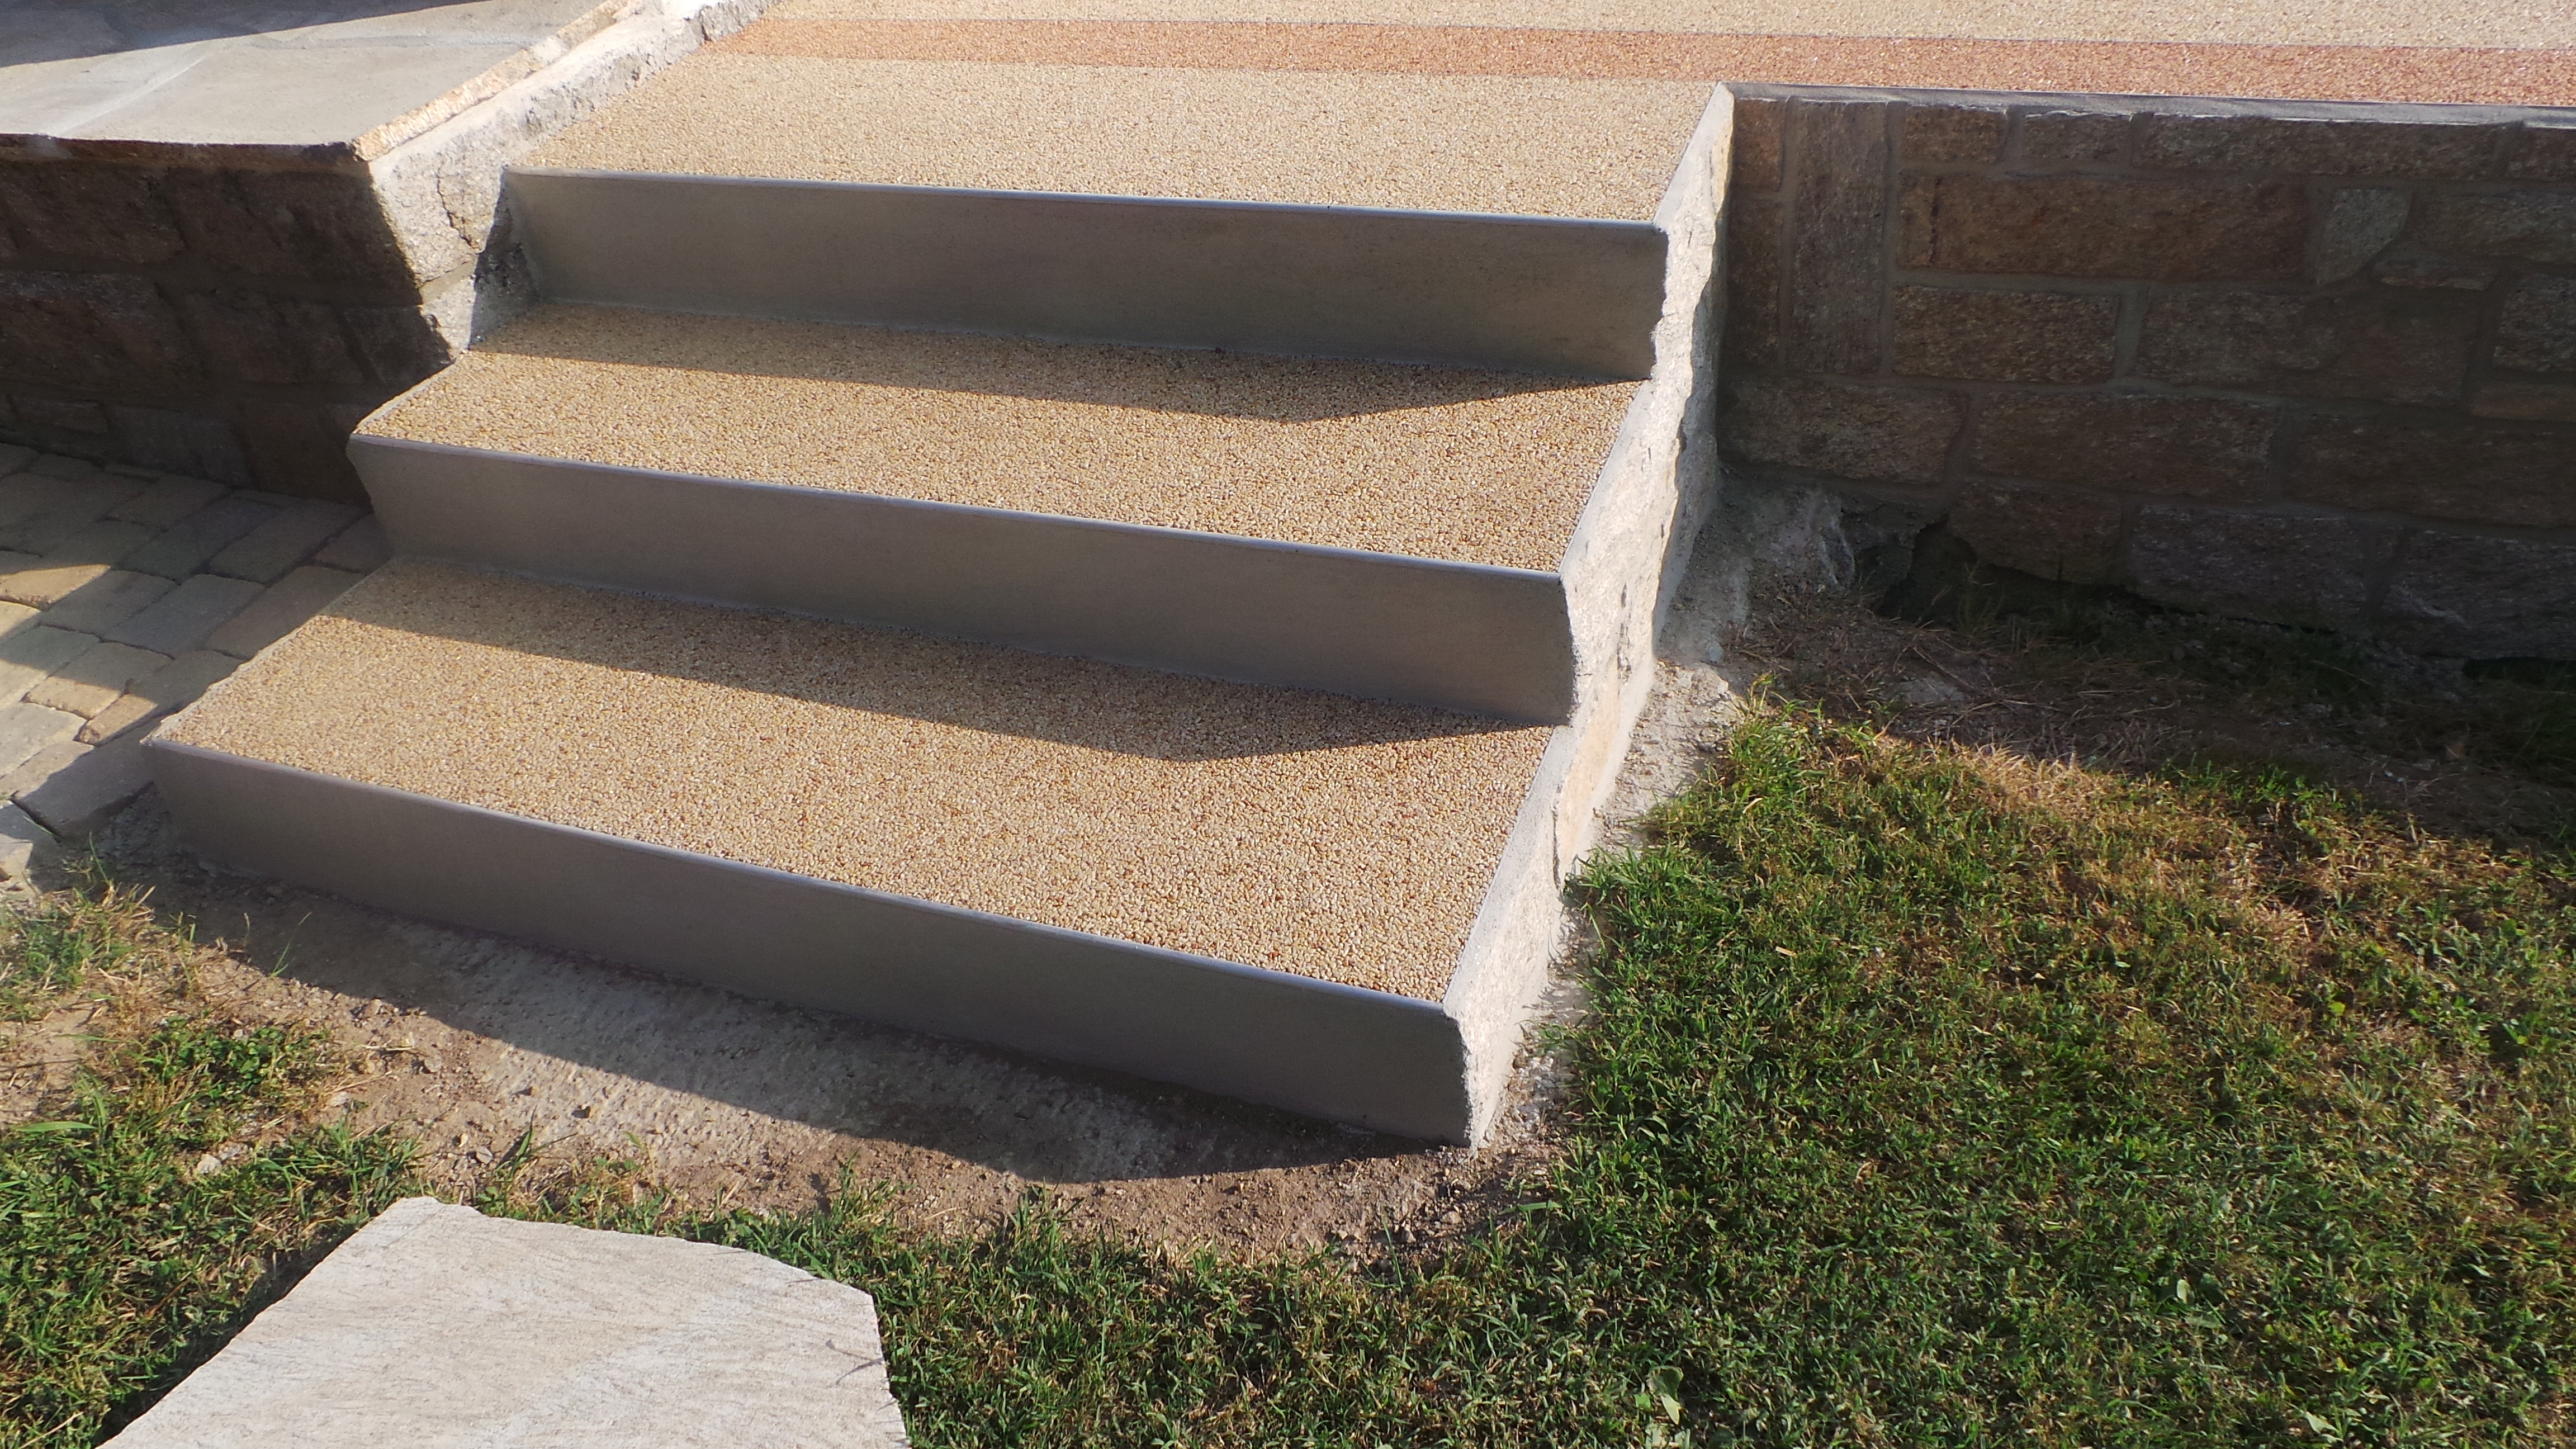 escalier ext rieur r sine. Black Bedroom Furniture Sets. Home Design Ideas